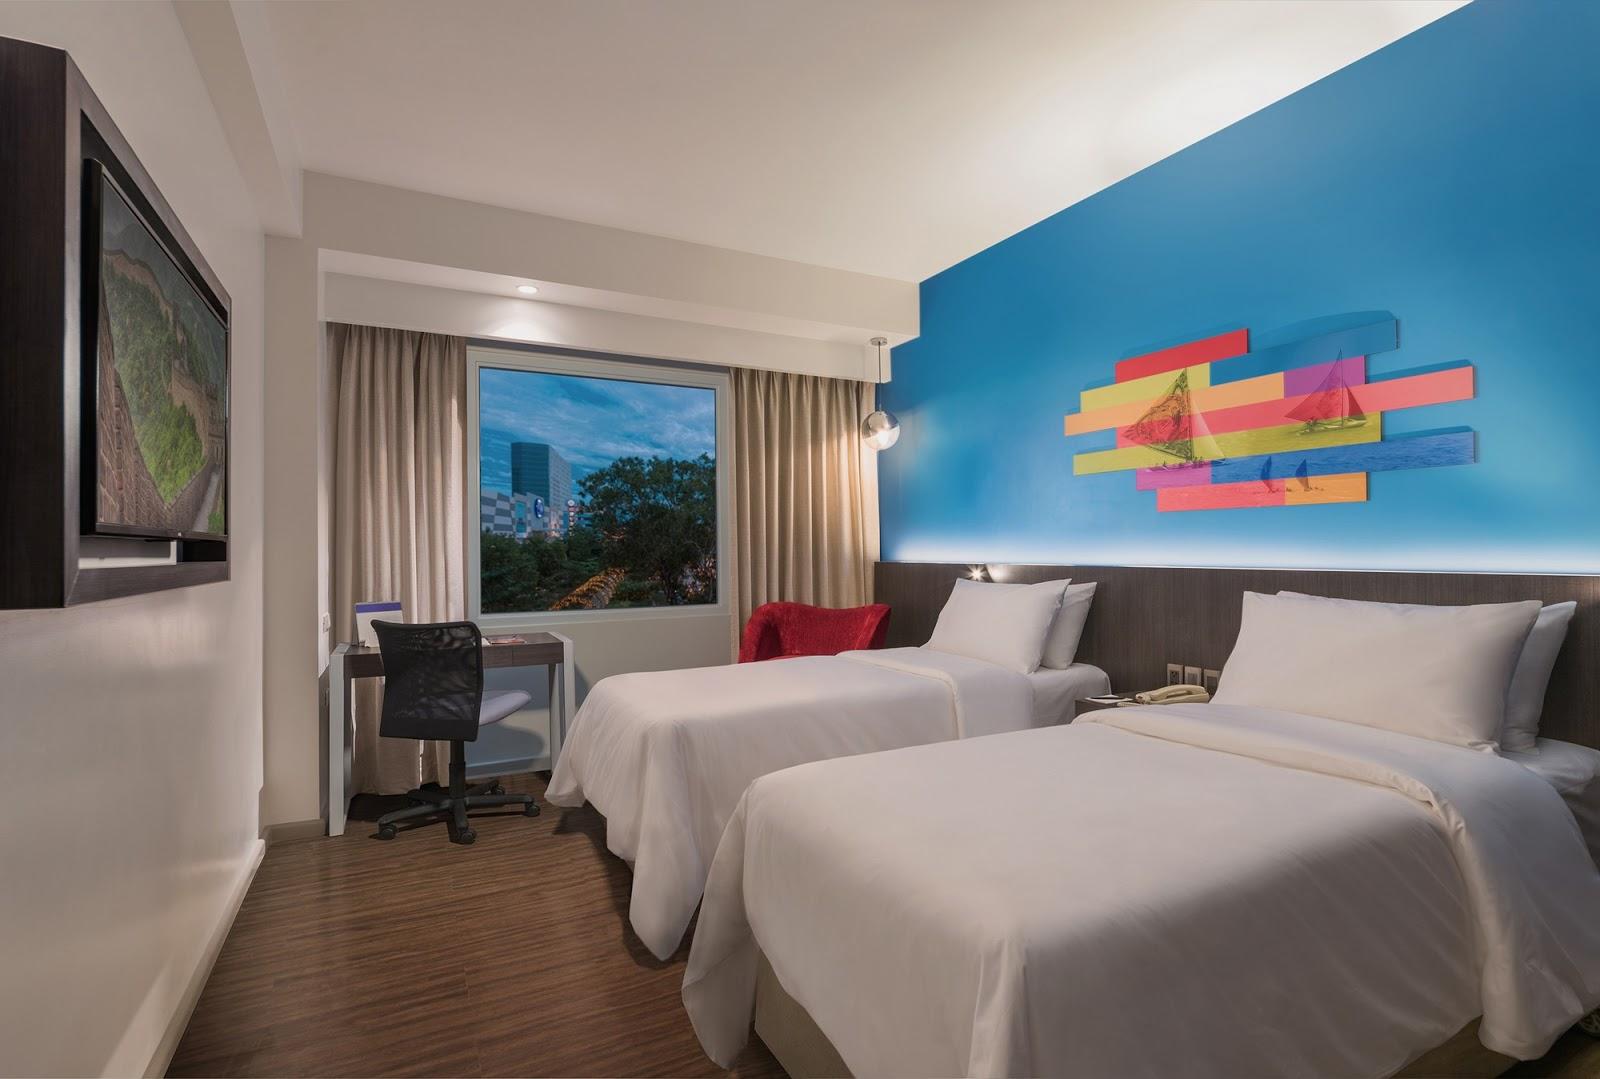 Park Inn by Radisson Iloilo Superior Room